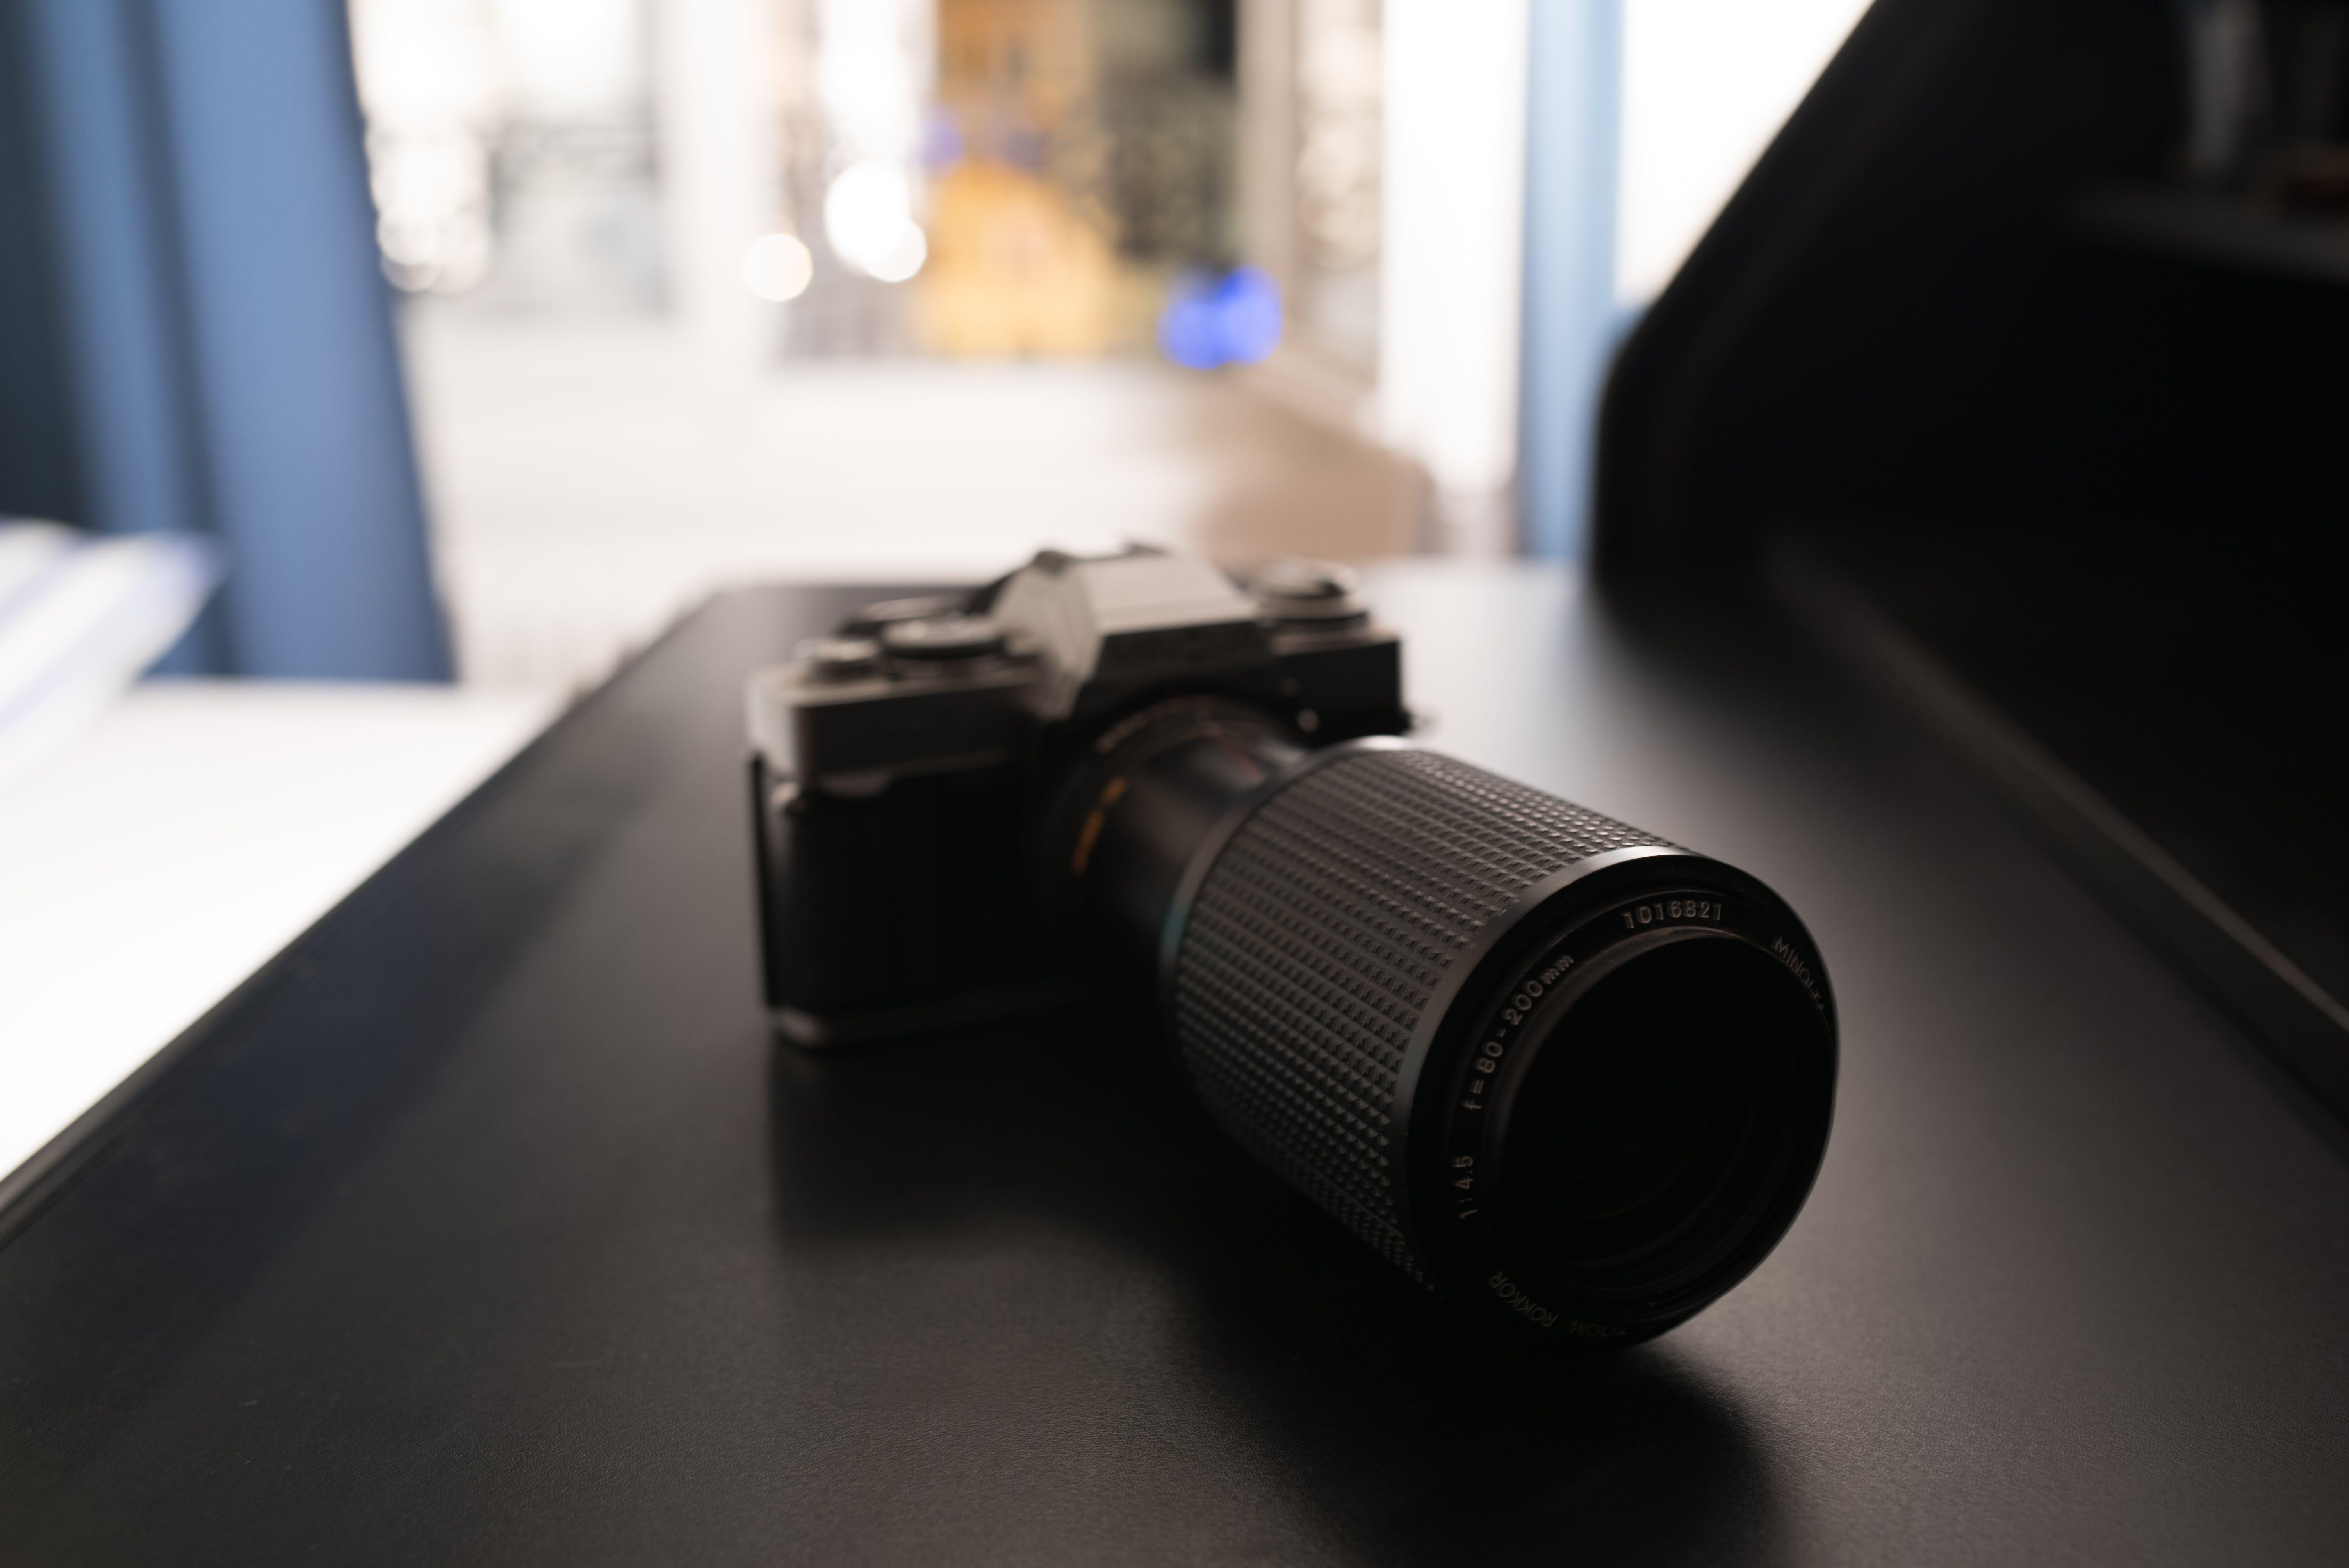 Free stock photo of blur, camera, desk, lens